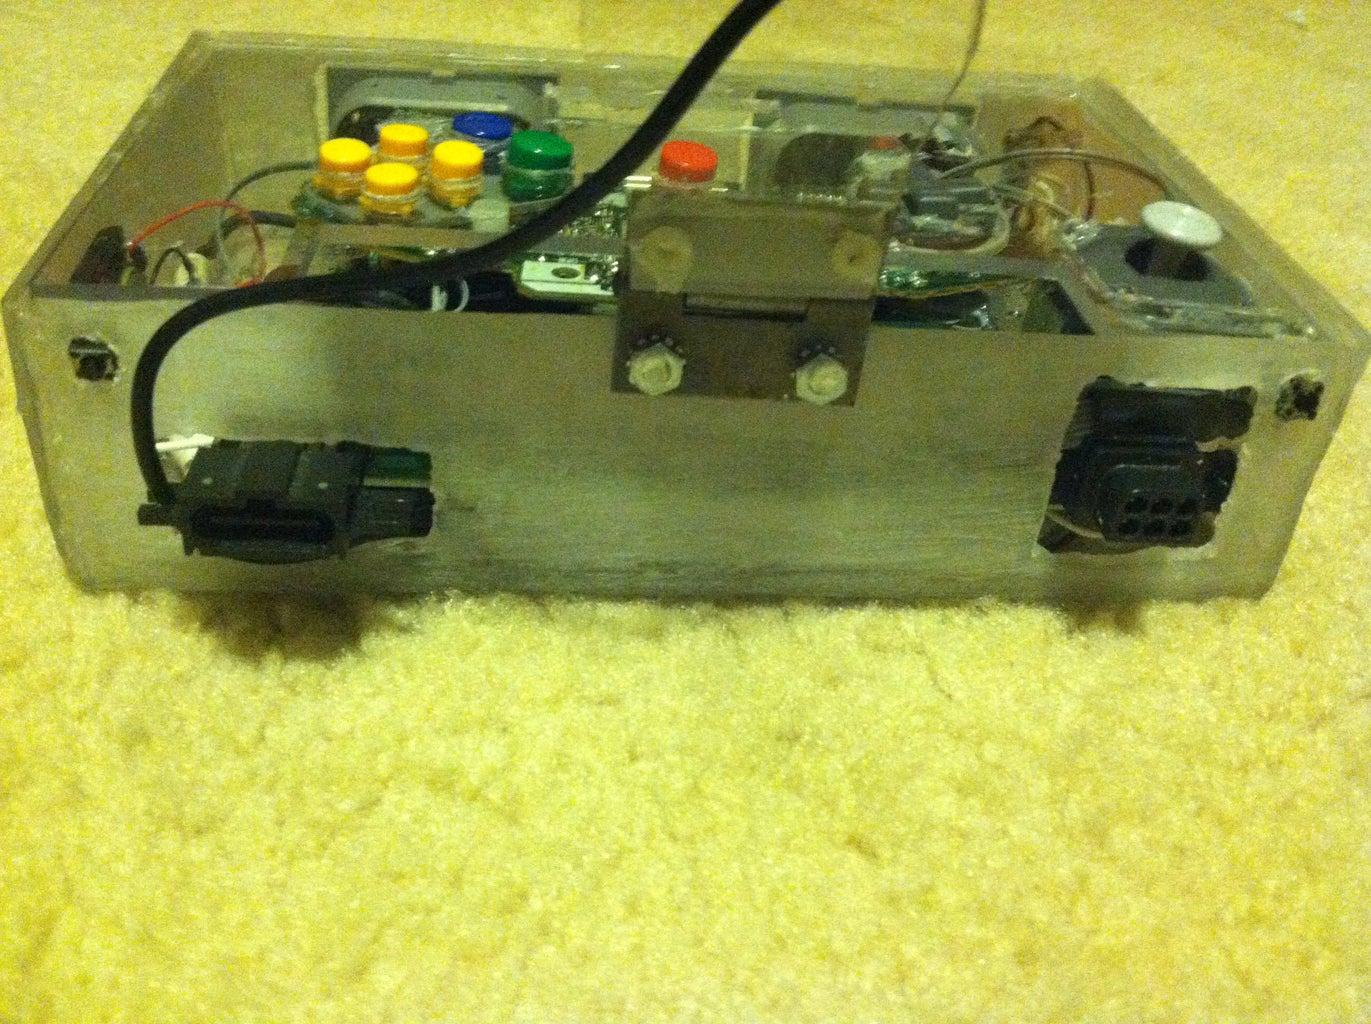 Wiring - Controller